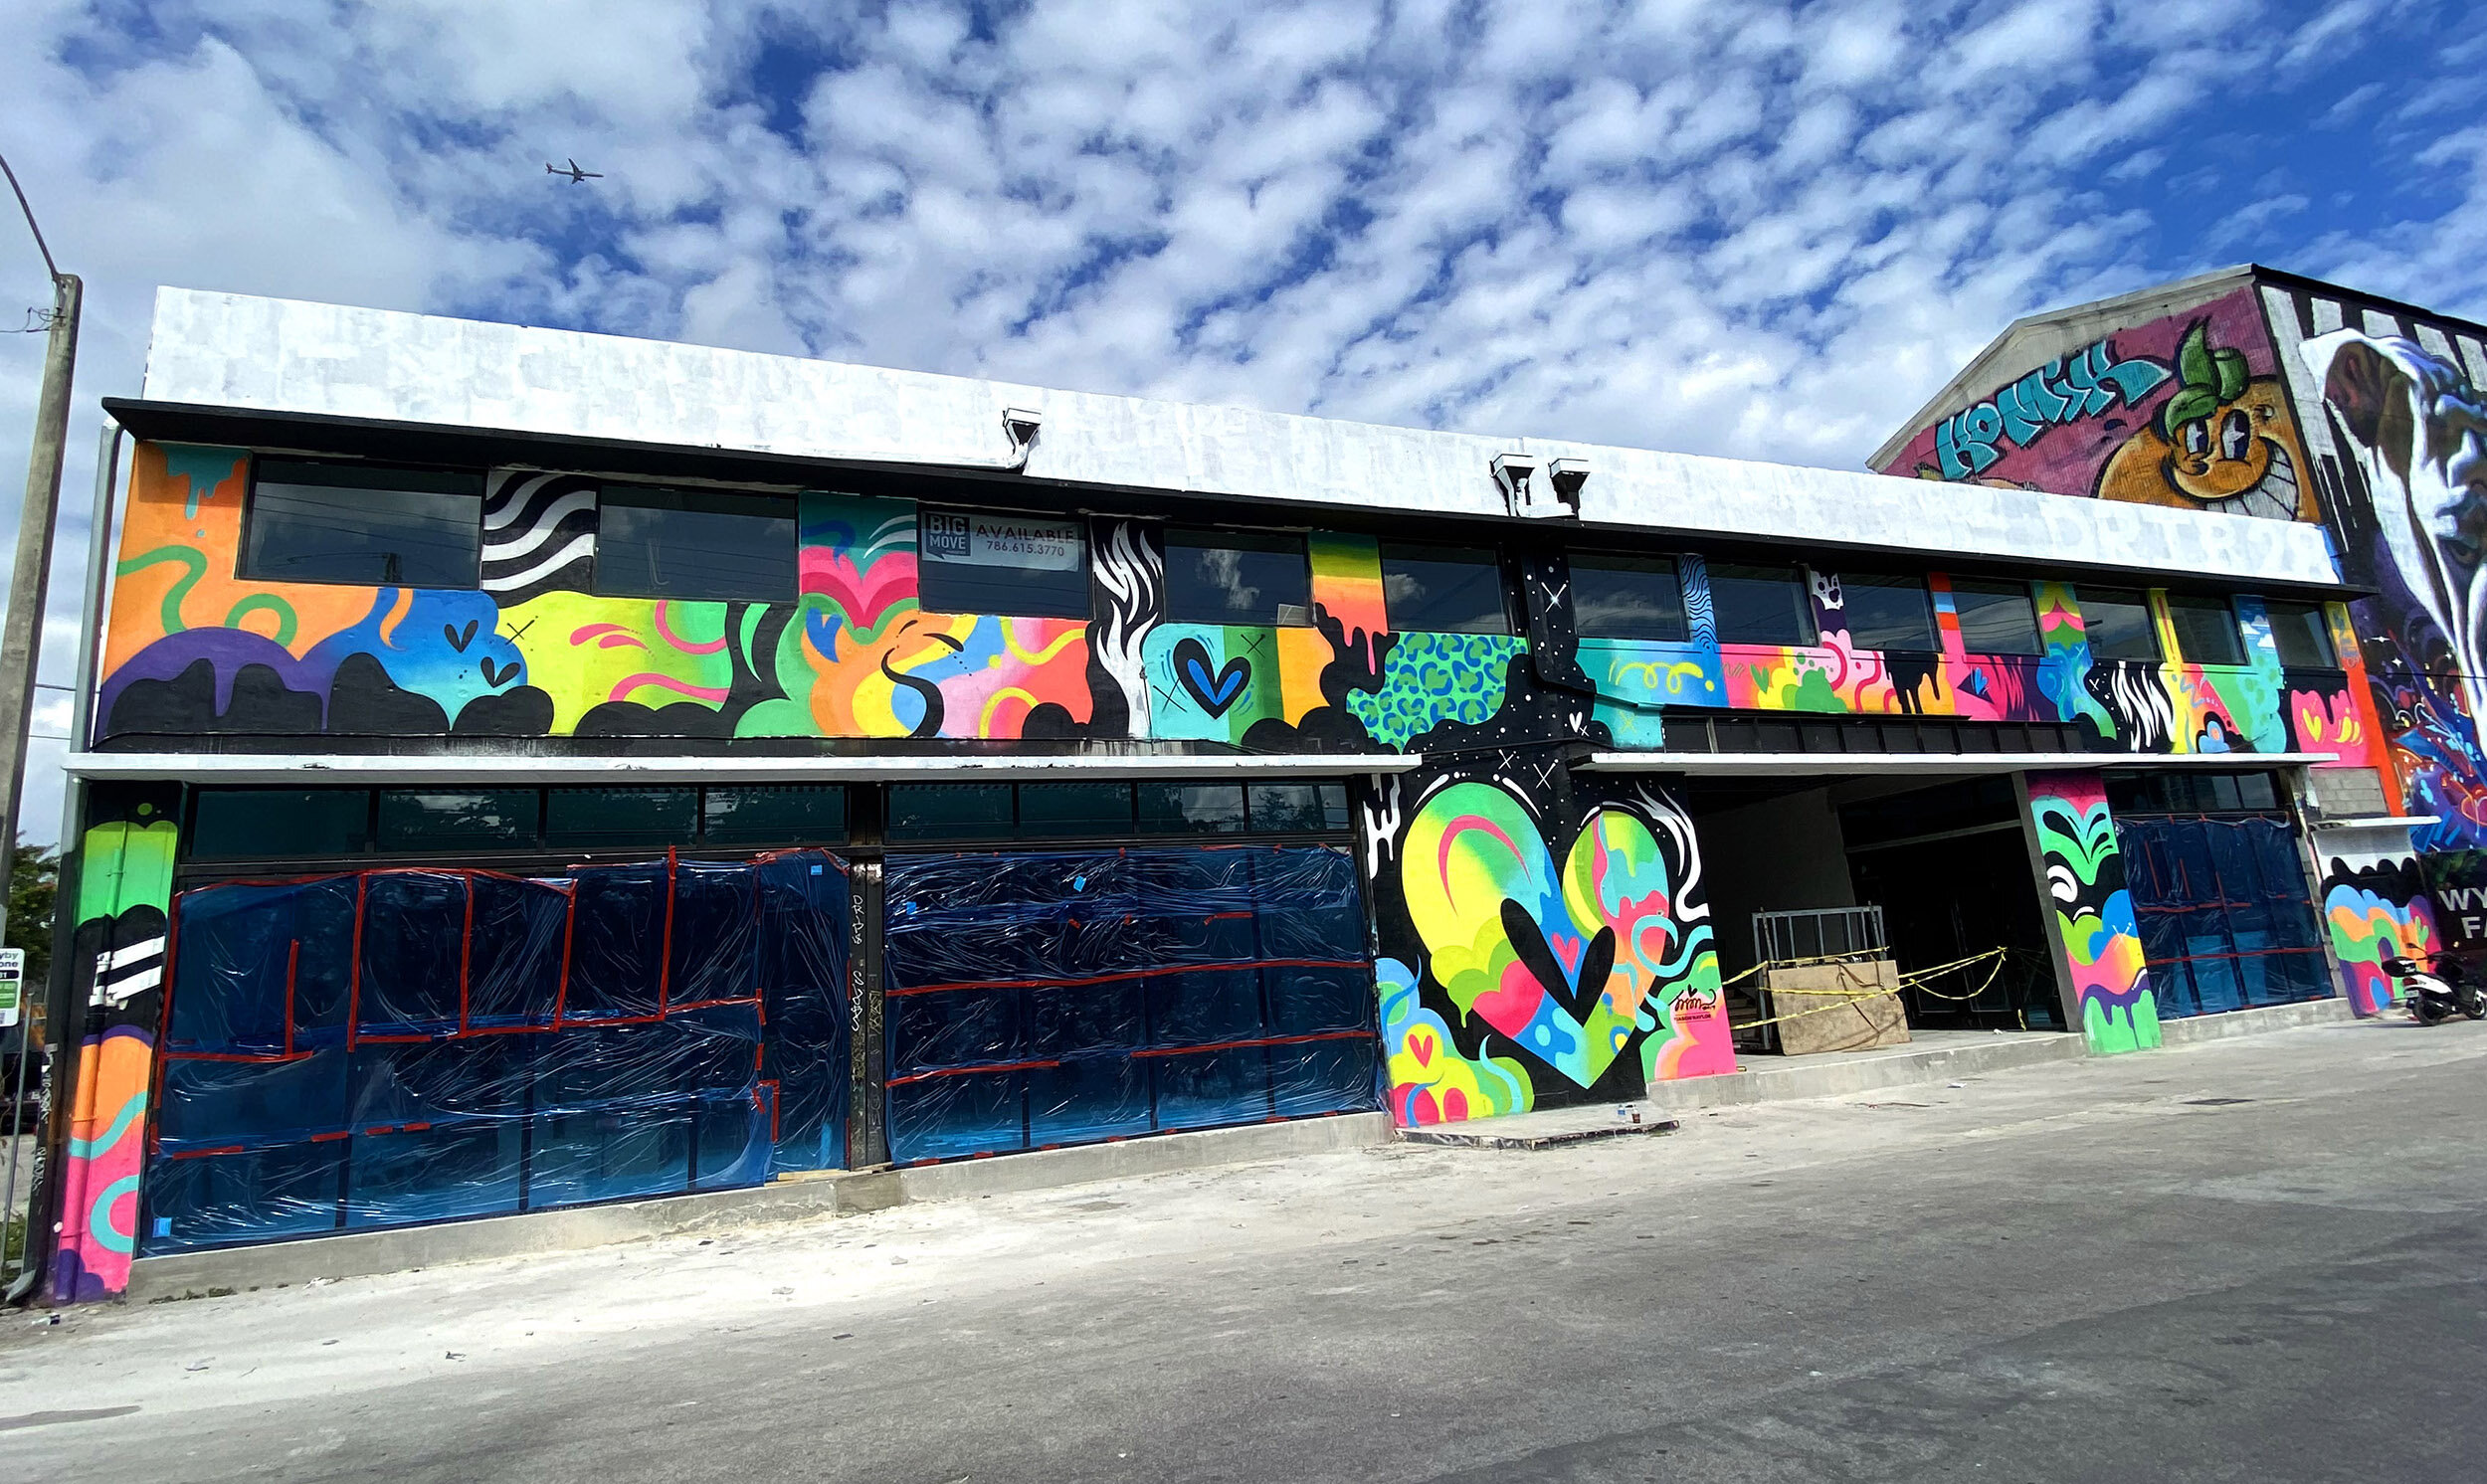 Heart large mural